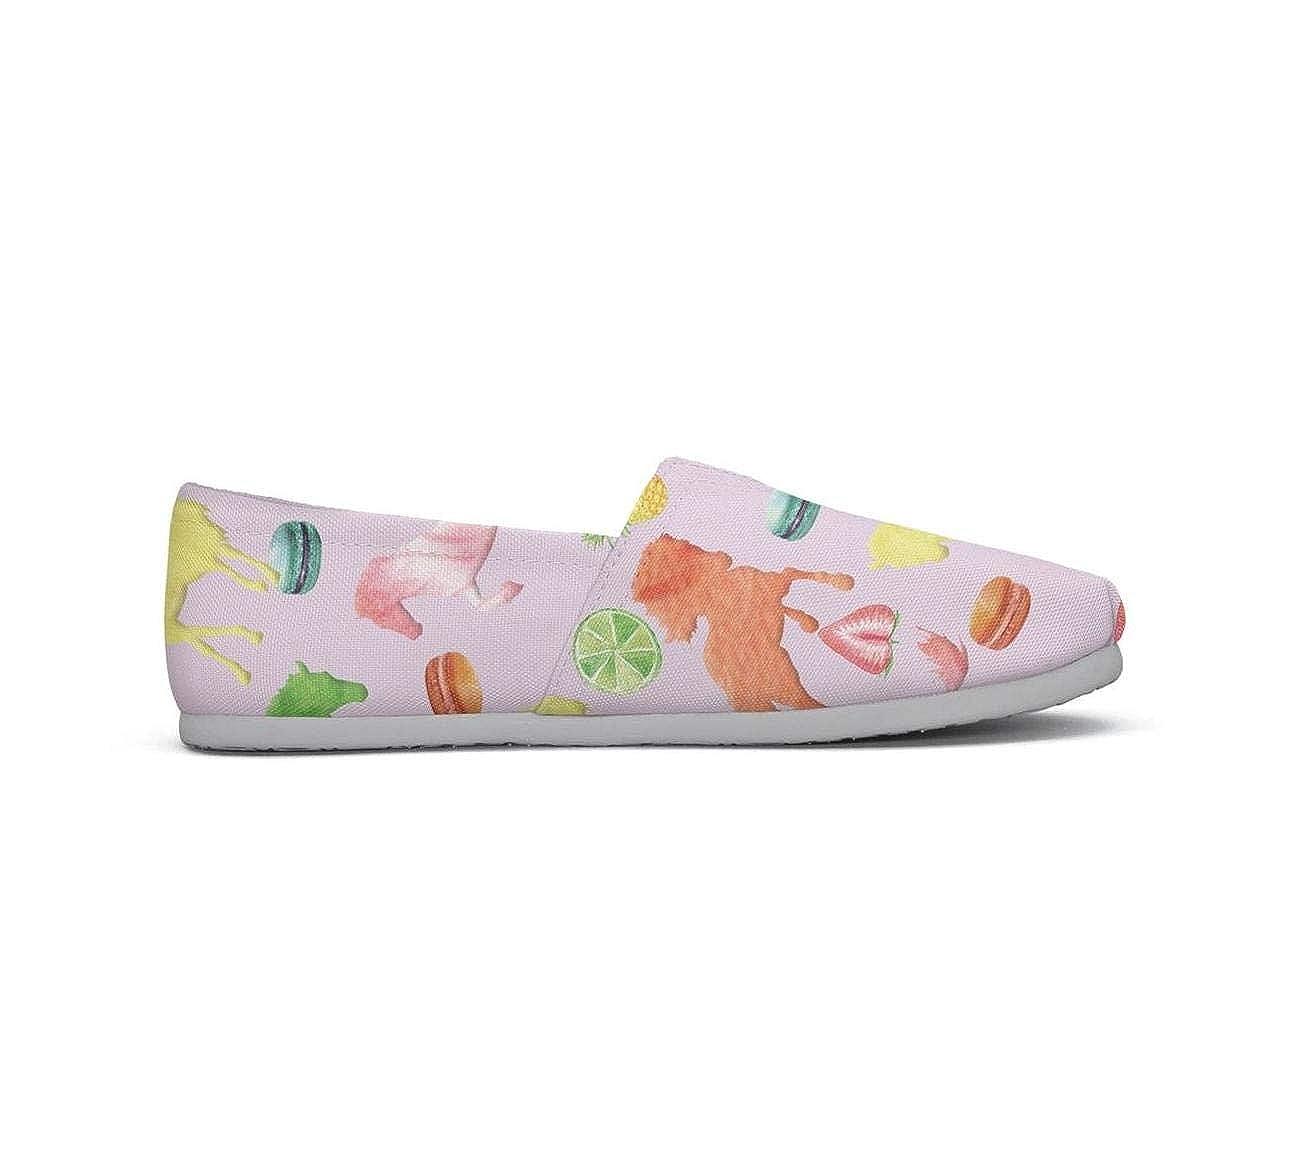 nkfbx Animal Horse Classic Flat Canva Shoes for Girls Dancing